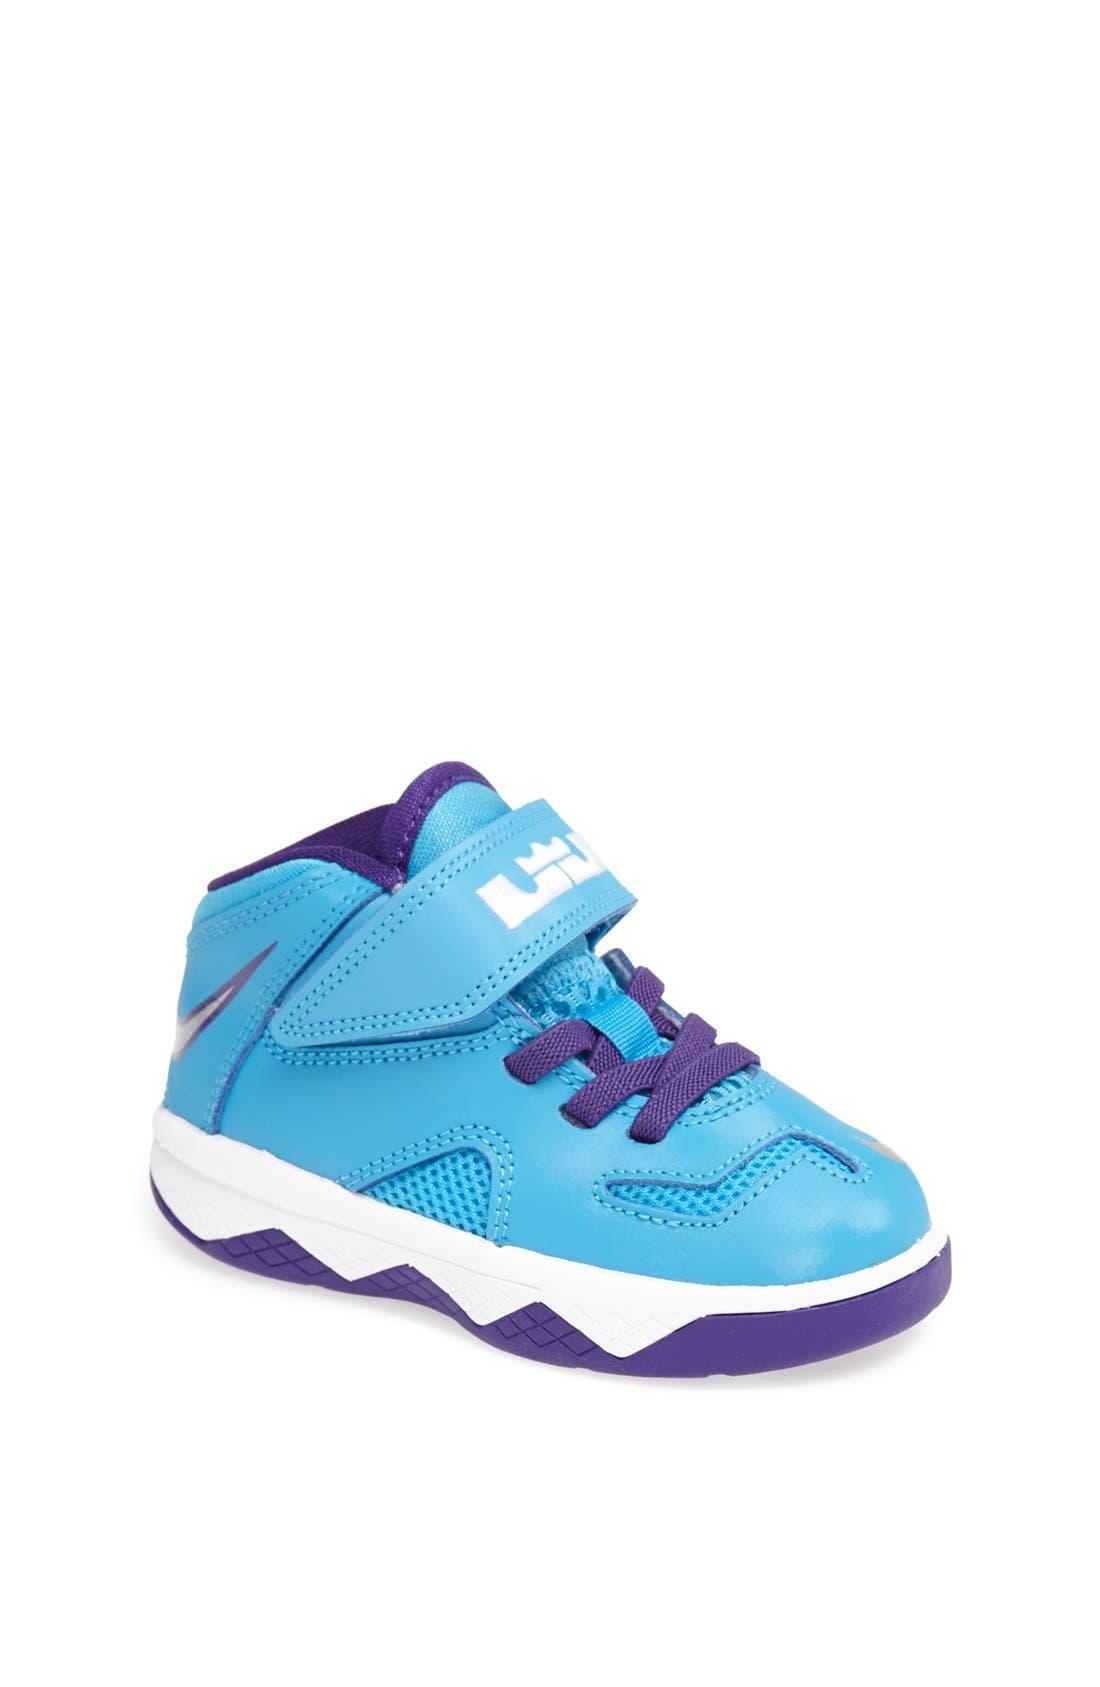 Alternate Image 1 Selected - Nike 'LeBron Soldier 7' Basketball Shoe (Baby, Walker & Toddler)